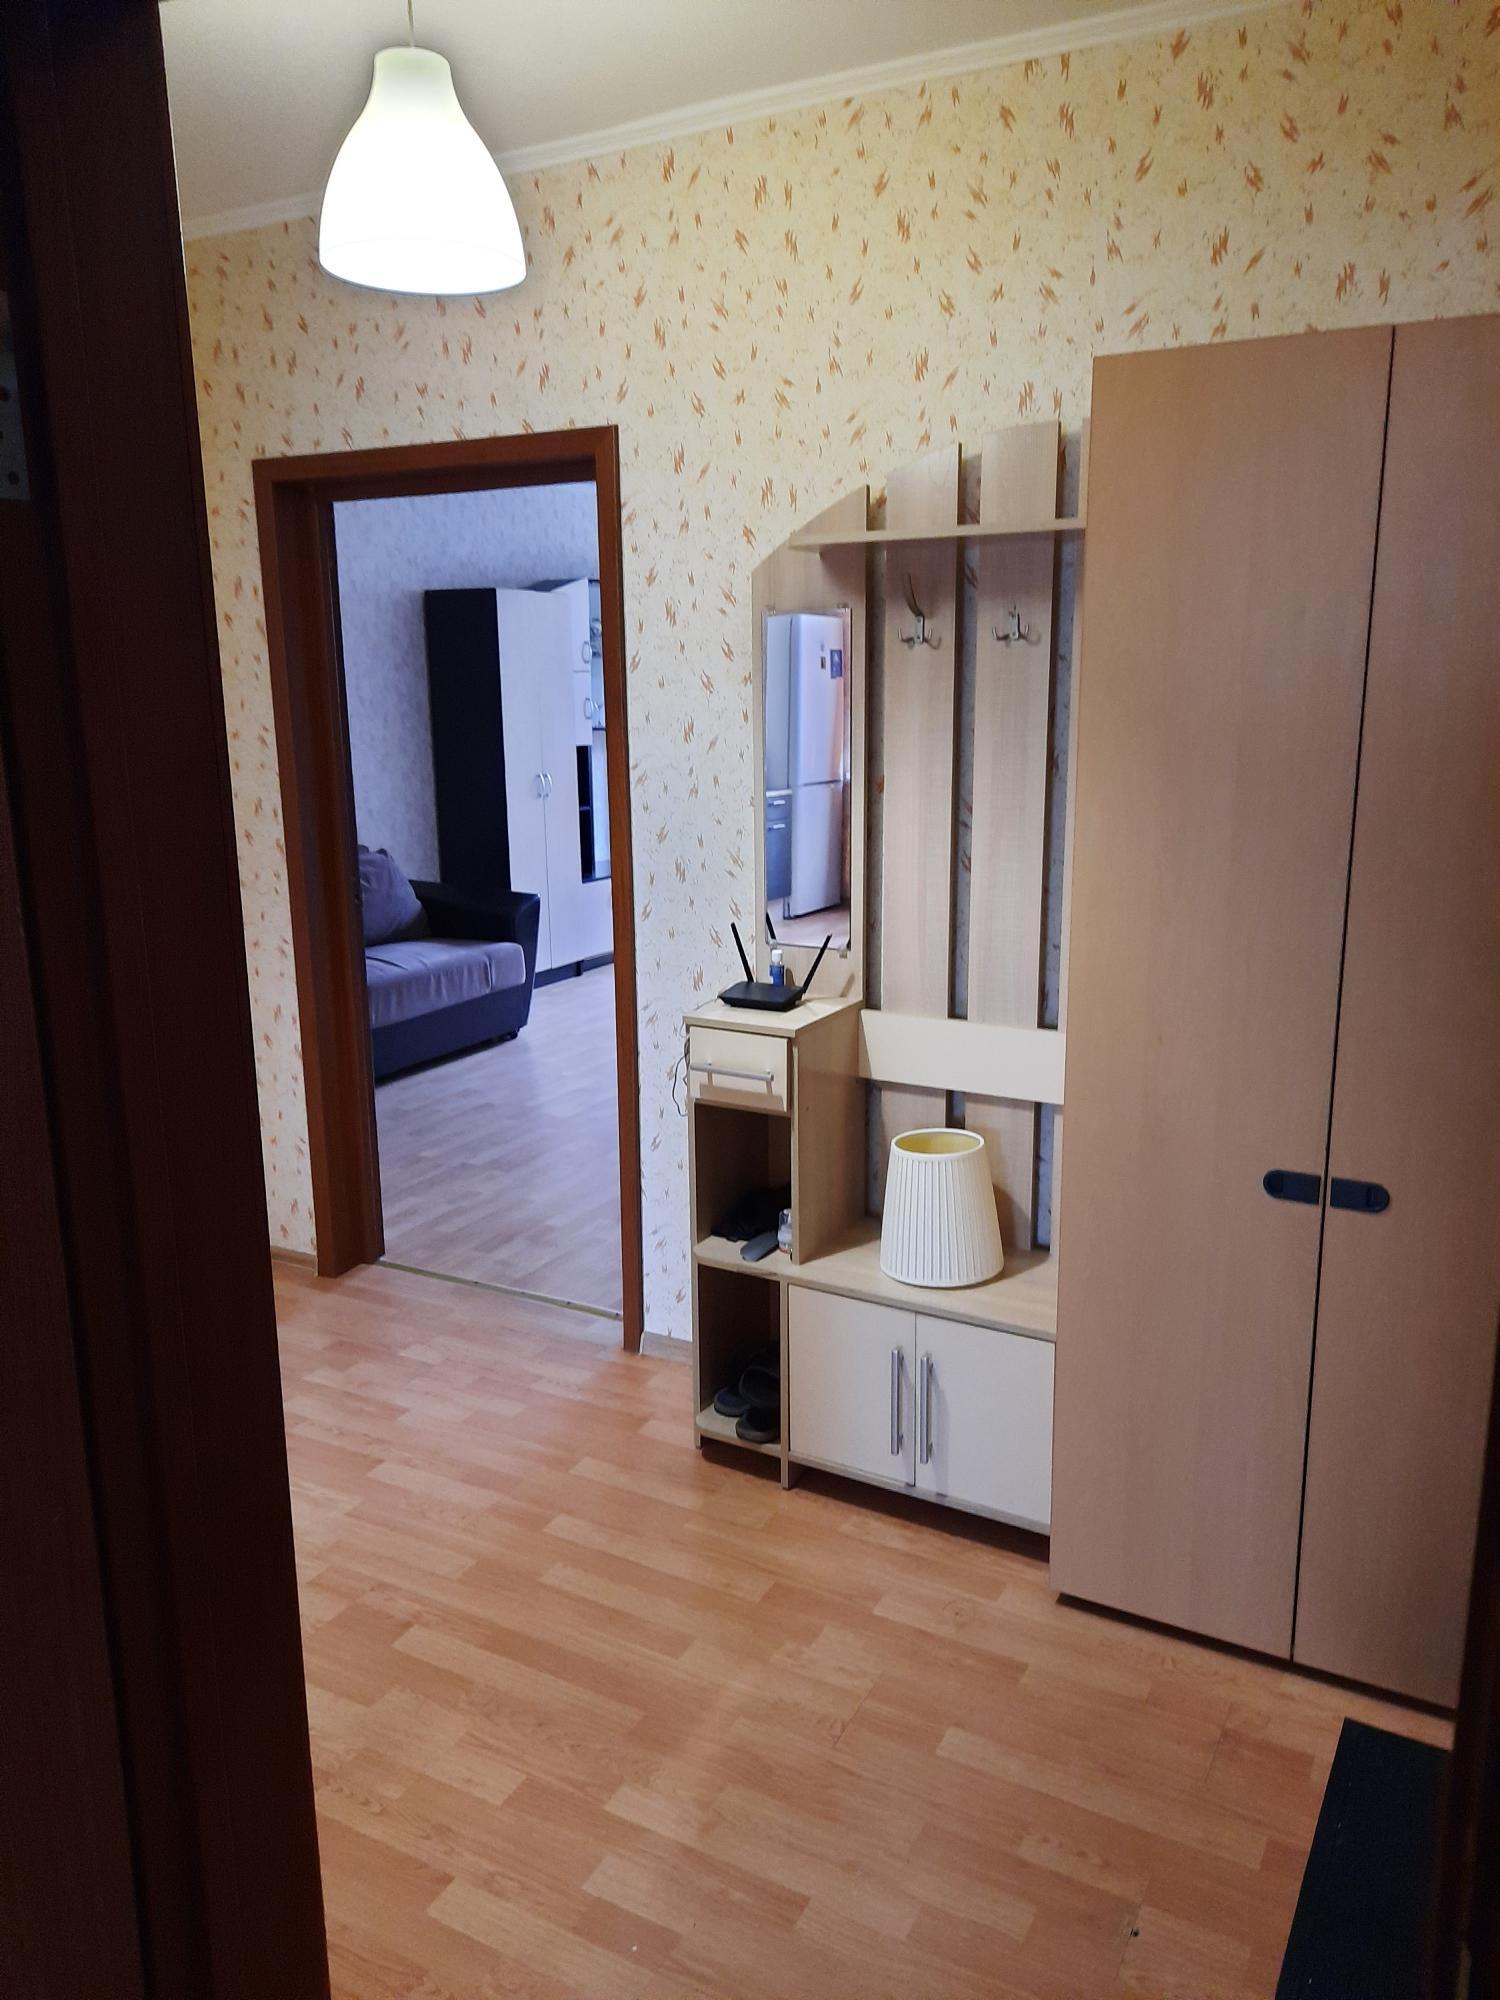 Квартира, 2 комнаты, 61 м² 89269689212 купить 2